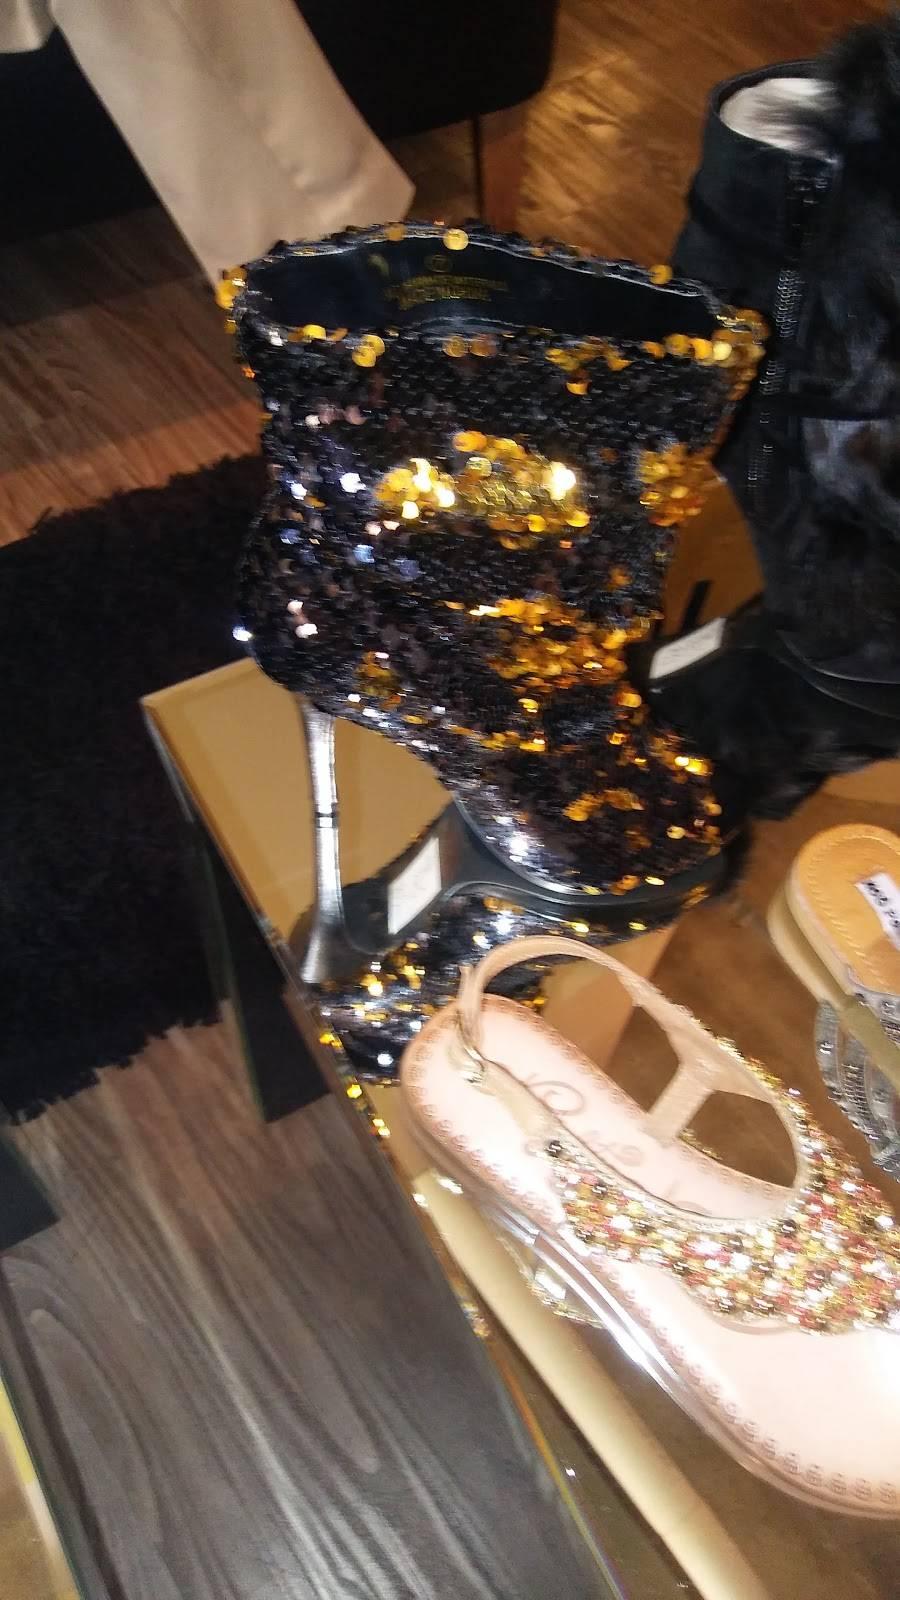 Epiphany Boutique - clothing store  | Photo 8 of 8 | Address: 3431 Locust St, St. Louis, MO 63103, USA | Phone: (314) 249-5384